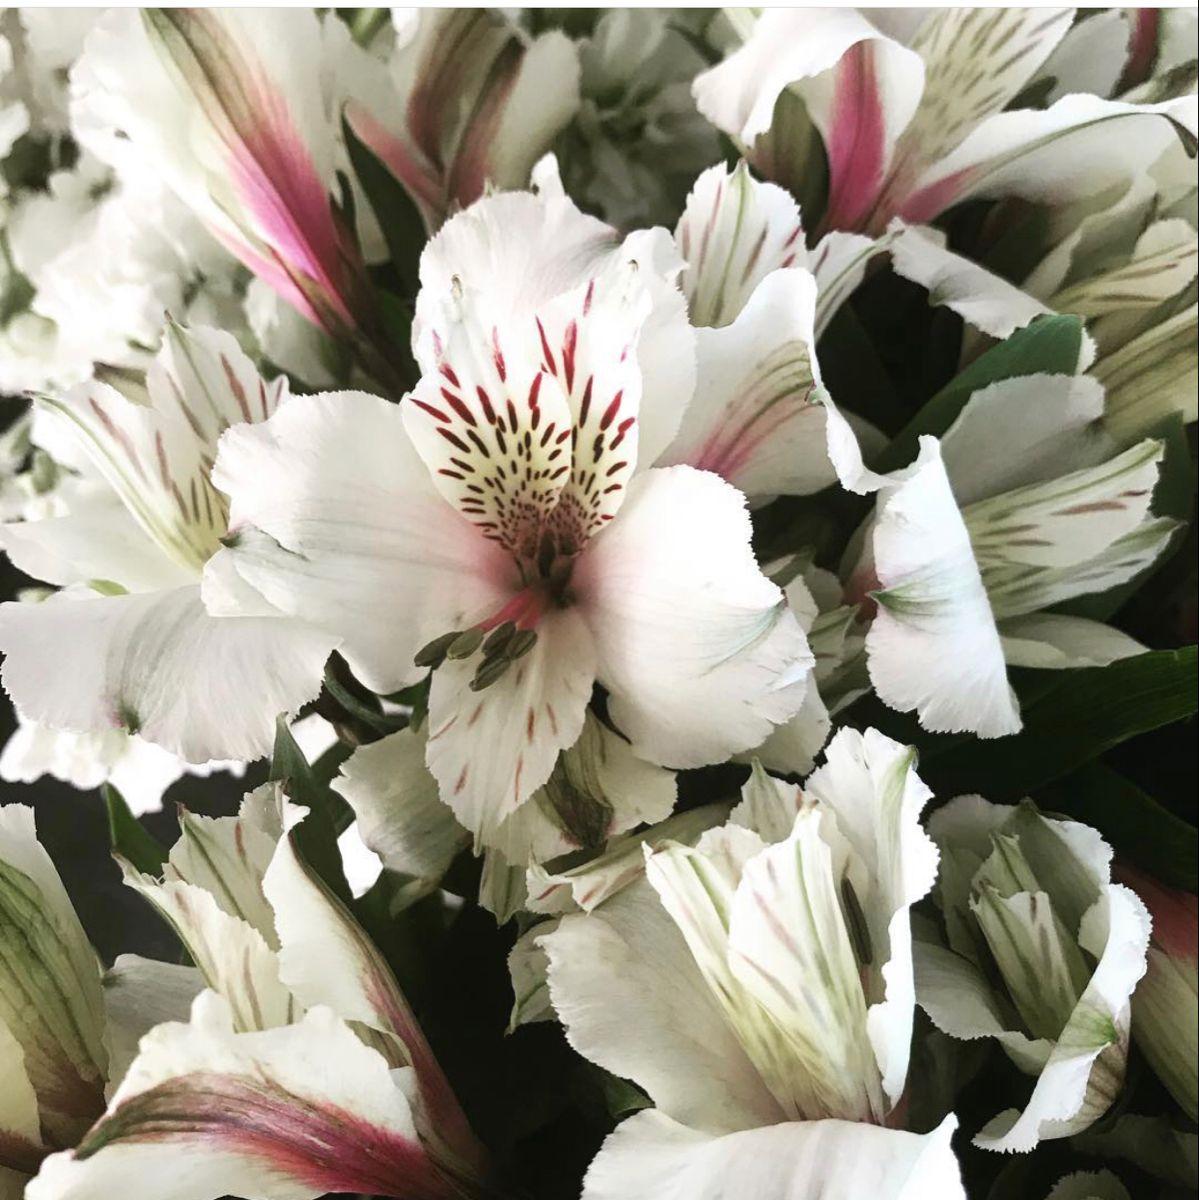 Wholesale White Alstroemeria Flower In 2020 Alstroemeria Wholesale Fresh Flowers Flowers